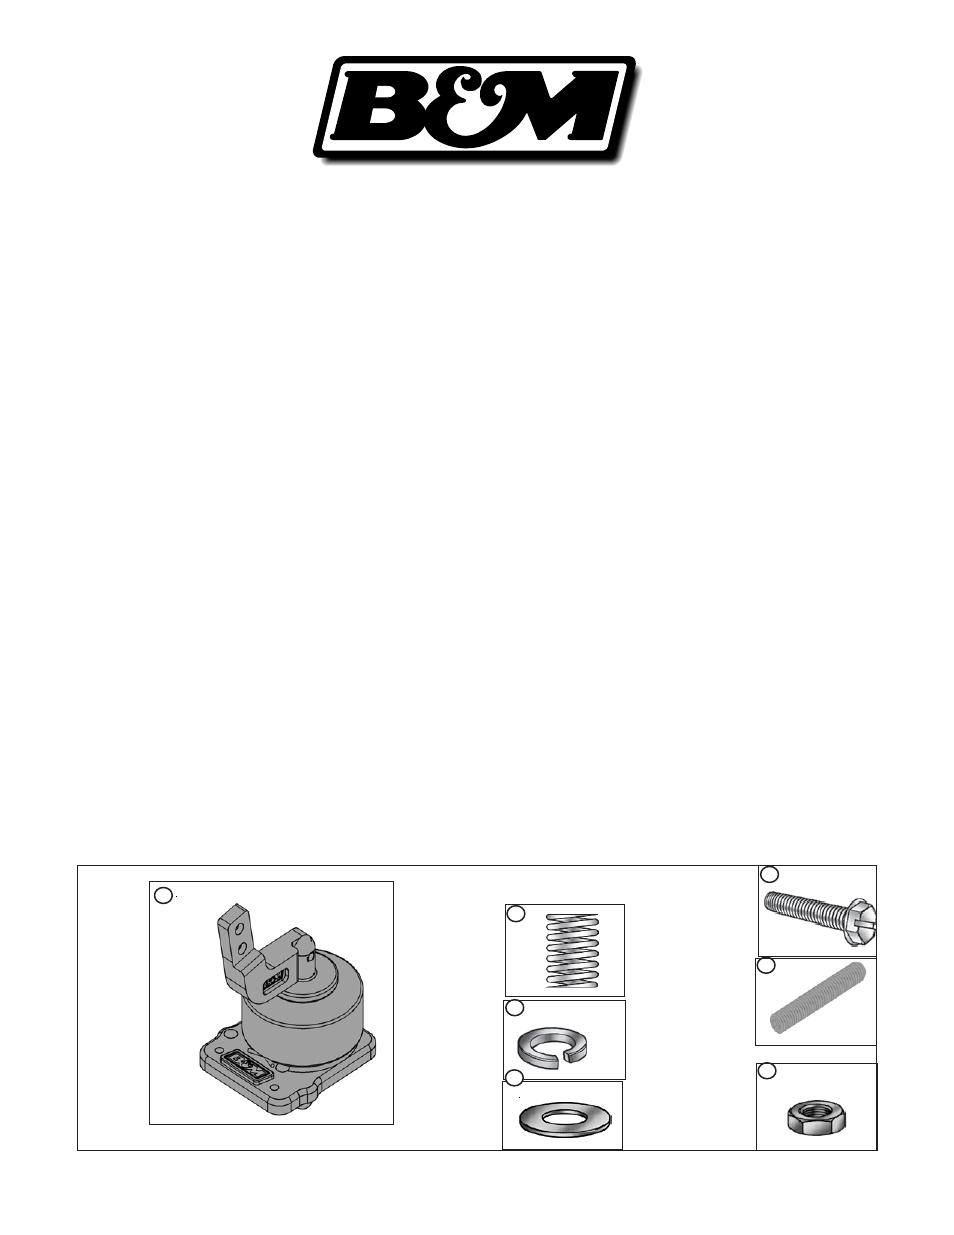 Bm 45043 Precision Sport Shifter O4 Gto User Manual 10 Pages